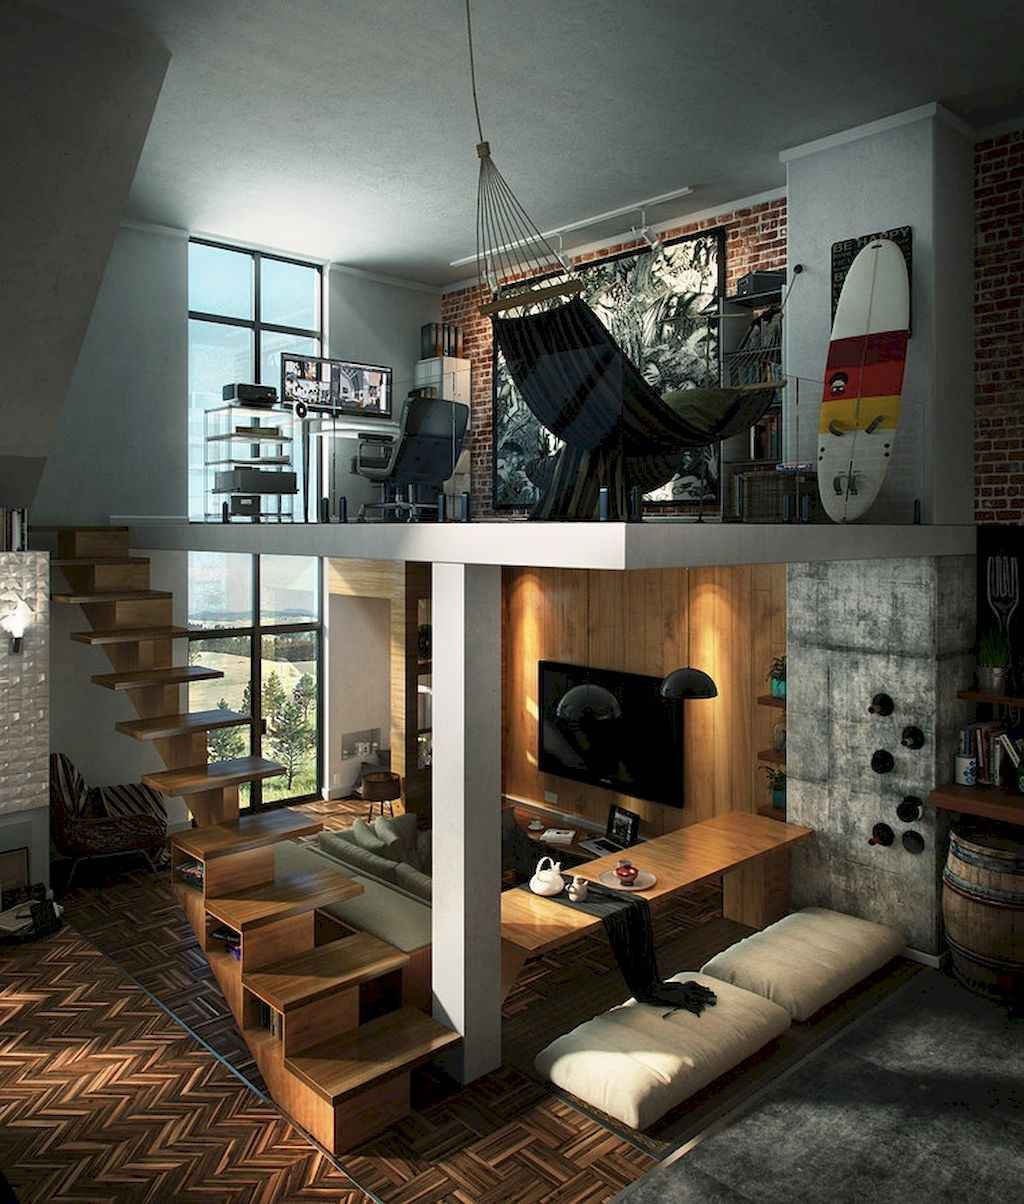 Cool creative loft apartment decorating ideas (15)